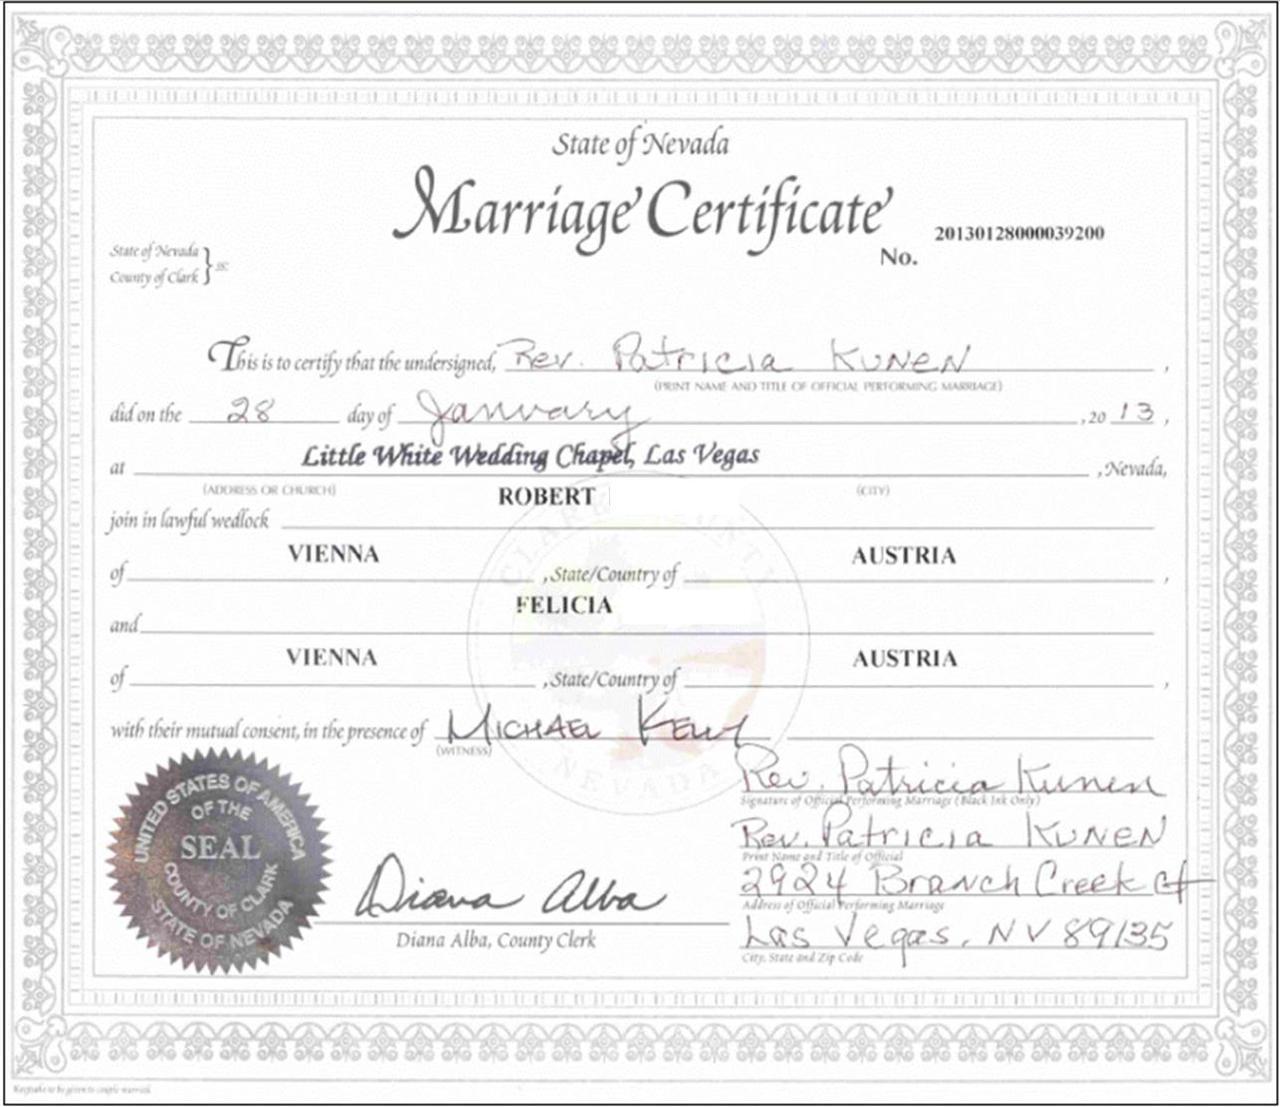 Über 50 dating in las vegas